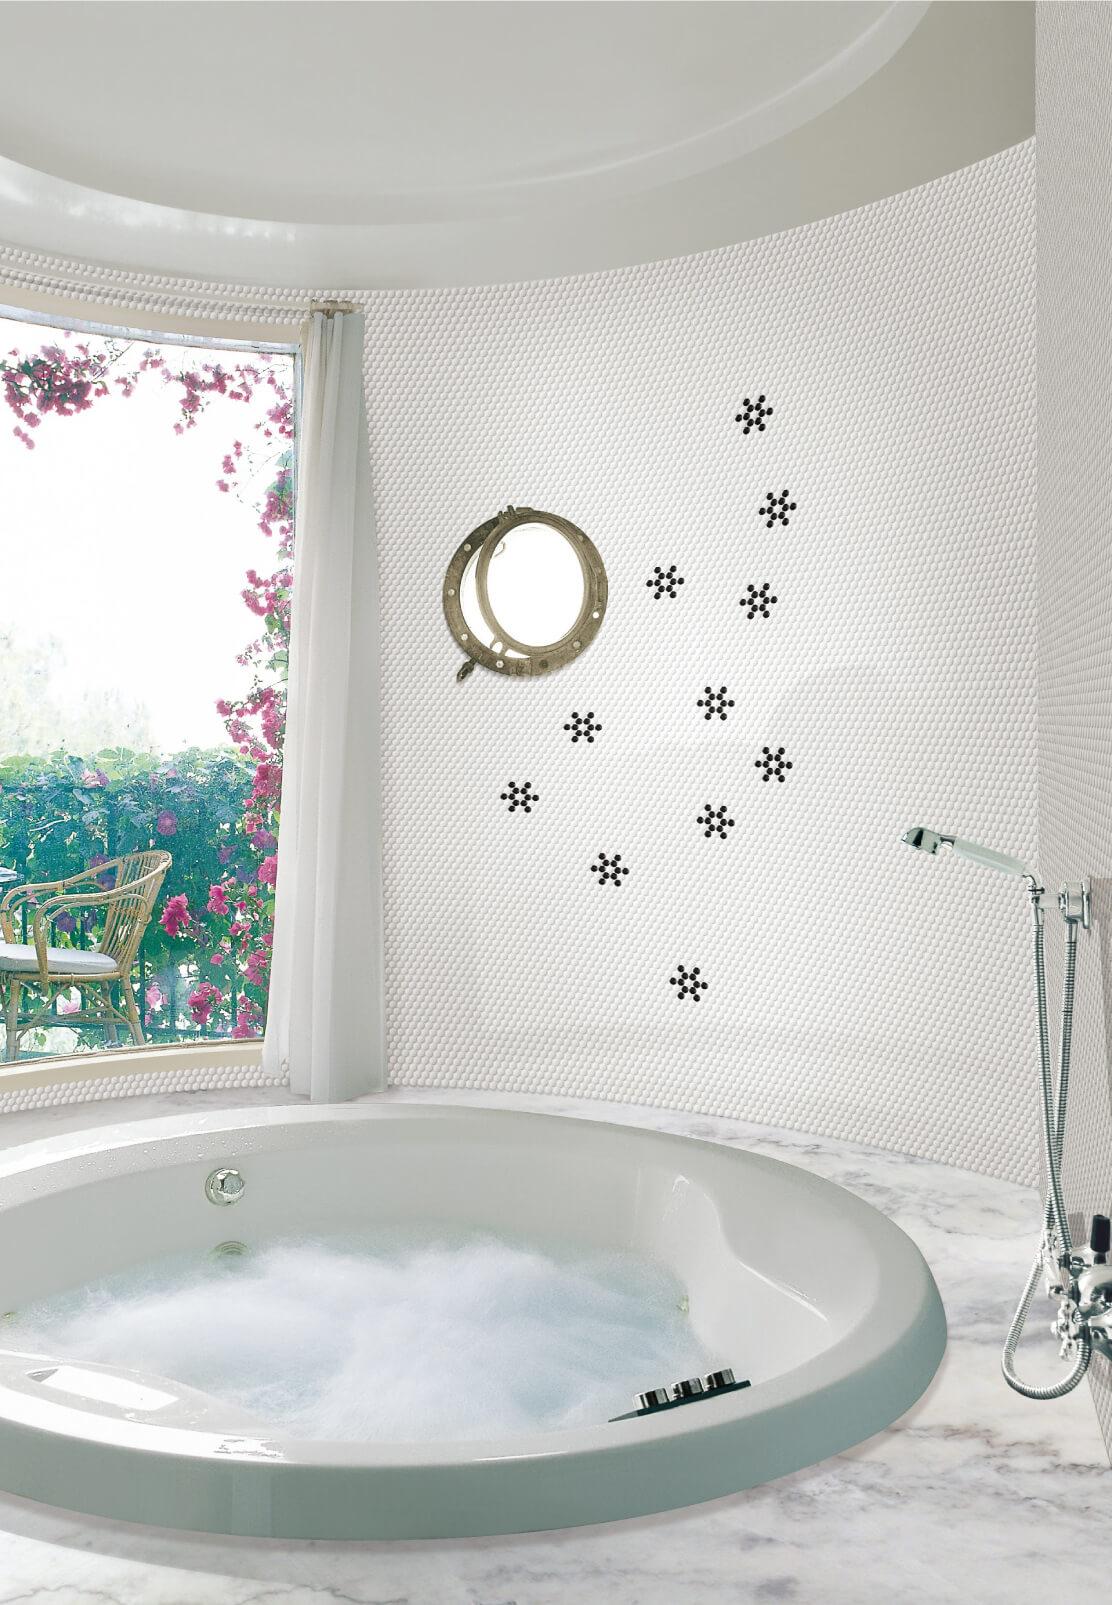 Penny round matte white - Byrd Tile